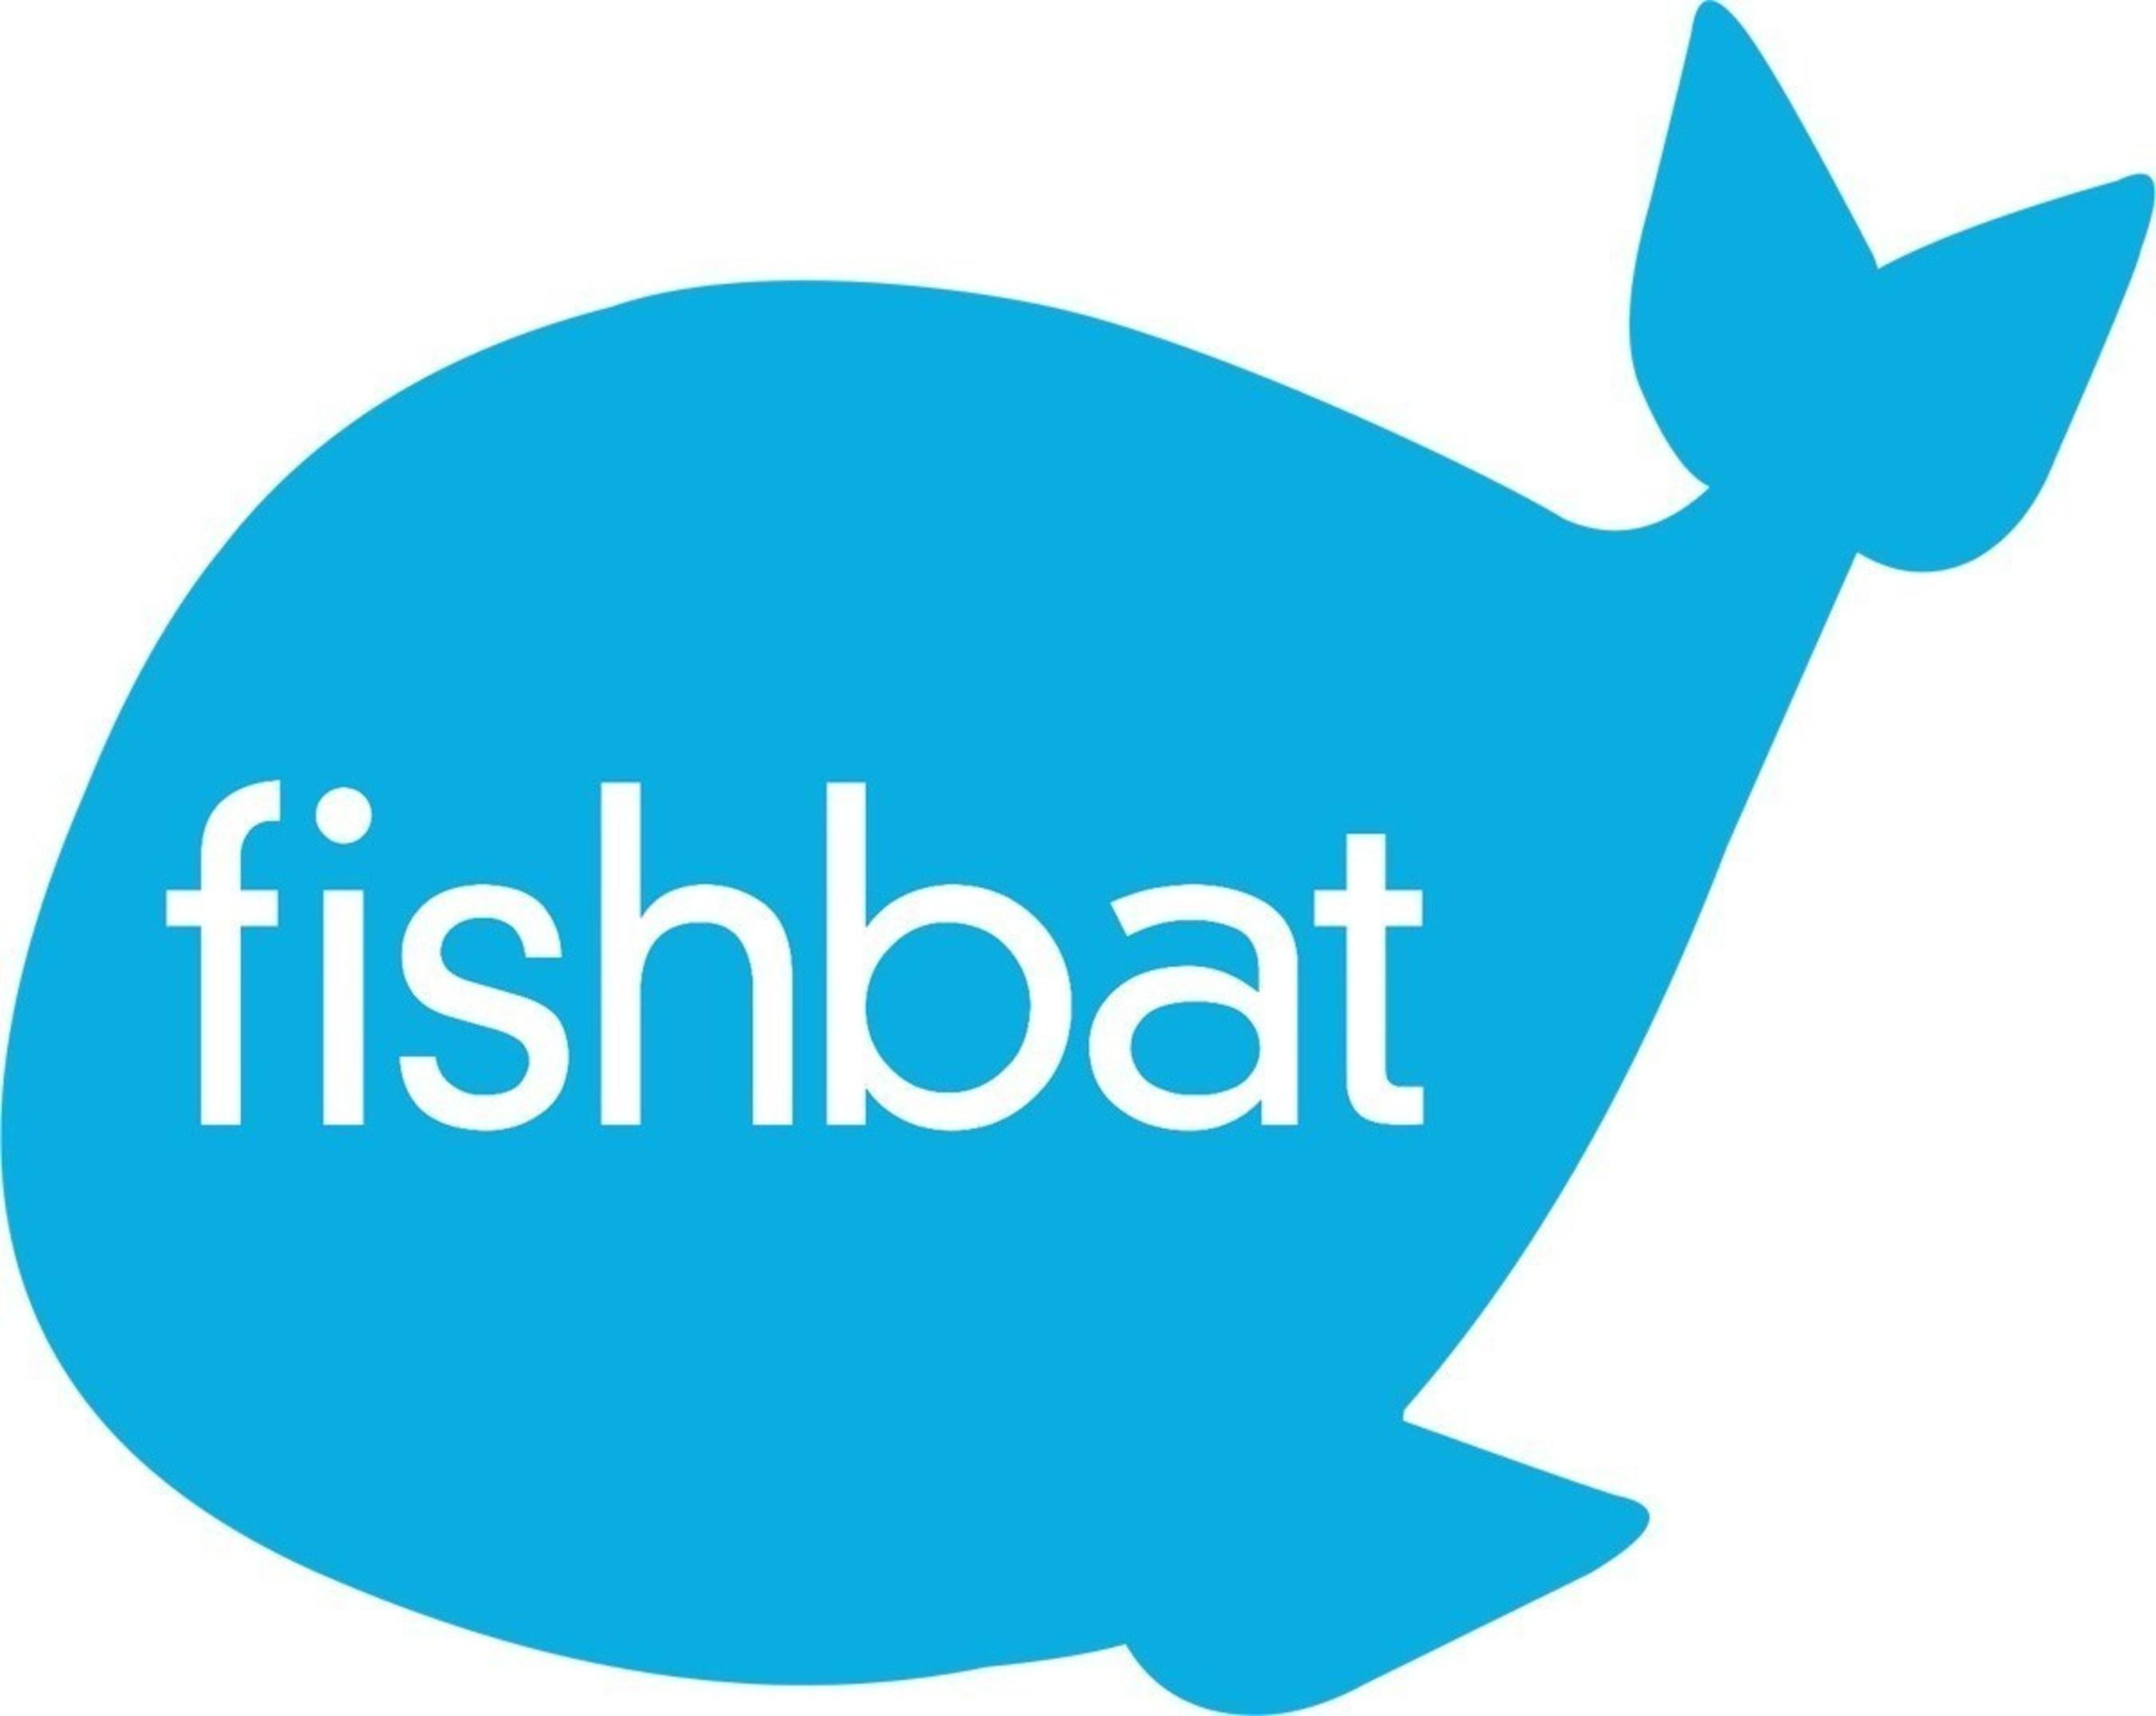 fishbat Gives 4 Tips To Help Yacht Transport Companies Increase Brand Awareness Through Social Media